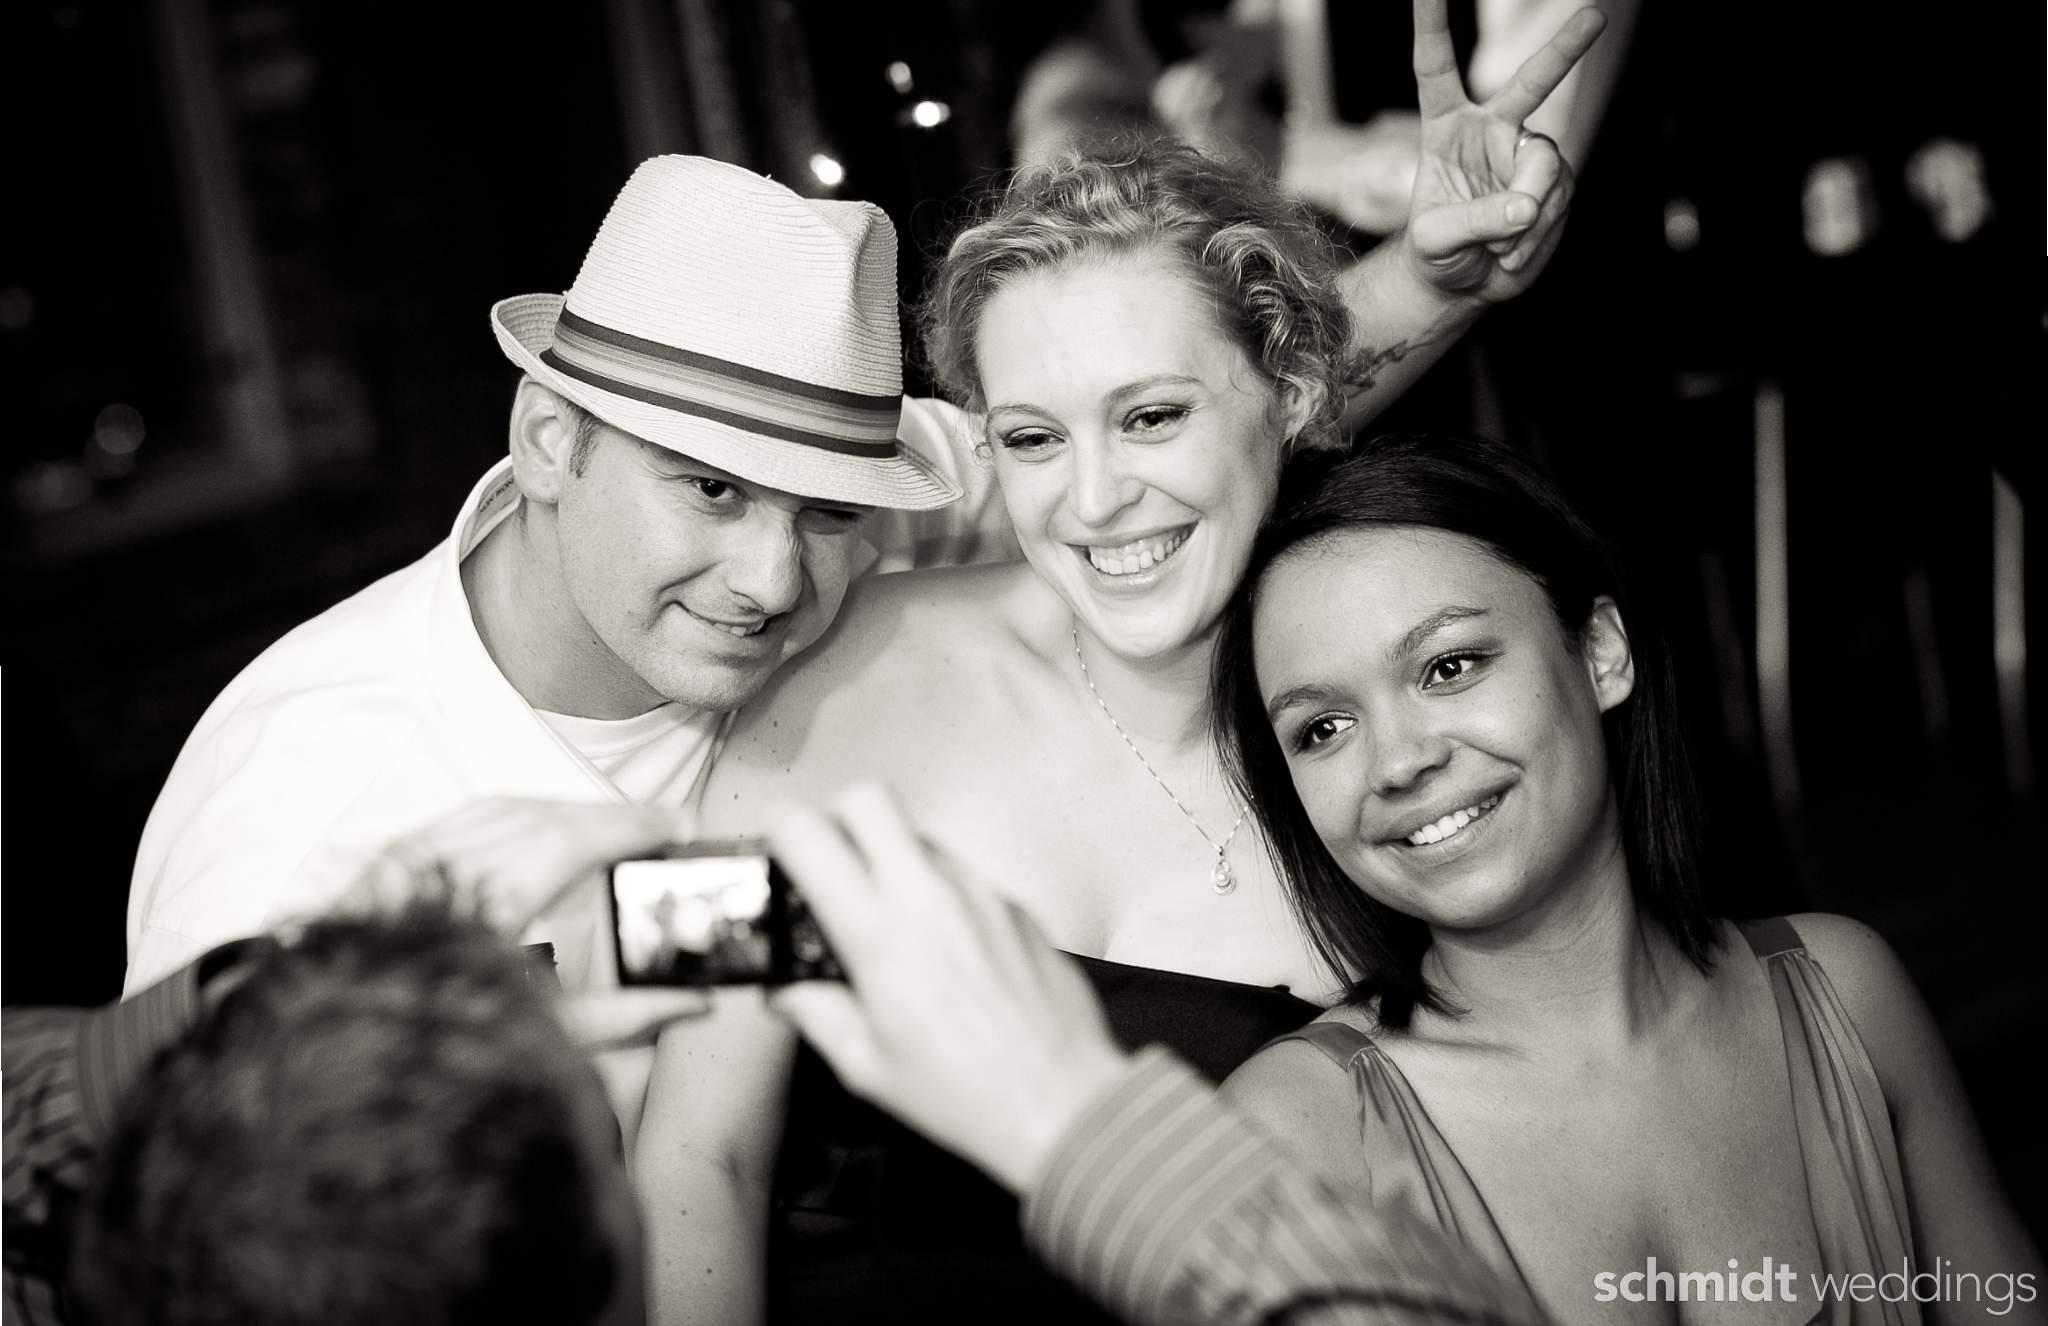 Fun and artistic wedding photographer schmidt weddings tom